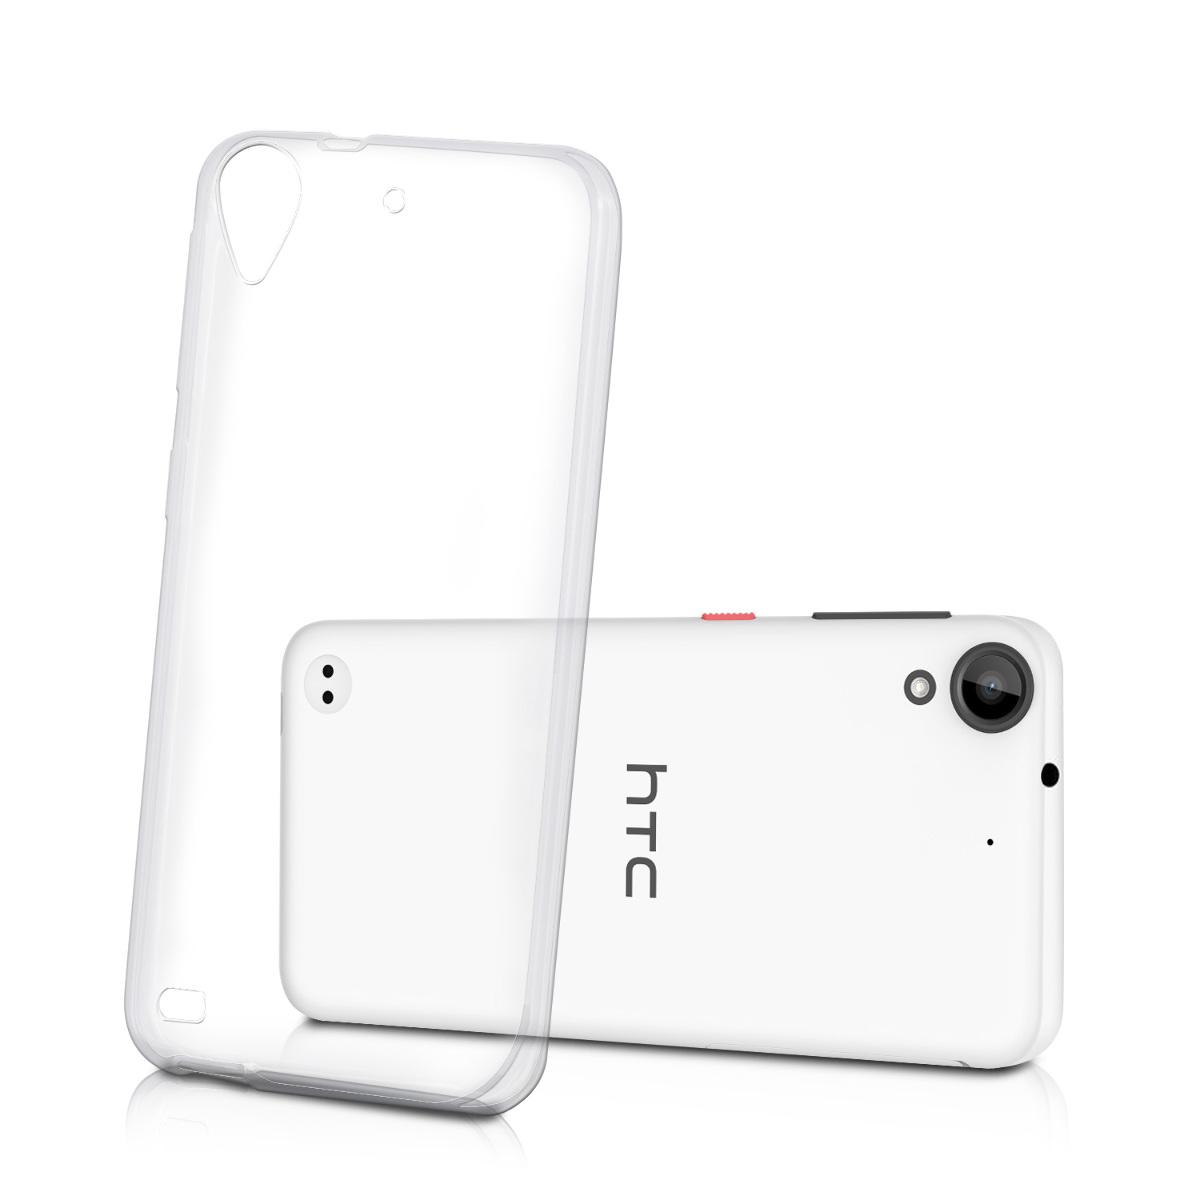 FUNDA-DE-TPU-SILICONA-PARA-HTC-DESIRE-530-CARCASA-PROTECTORA-ESTUCHE-MoVIL